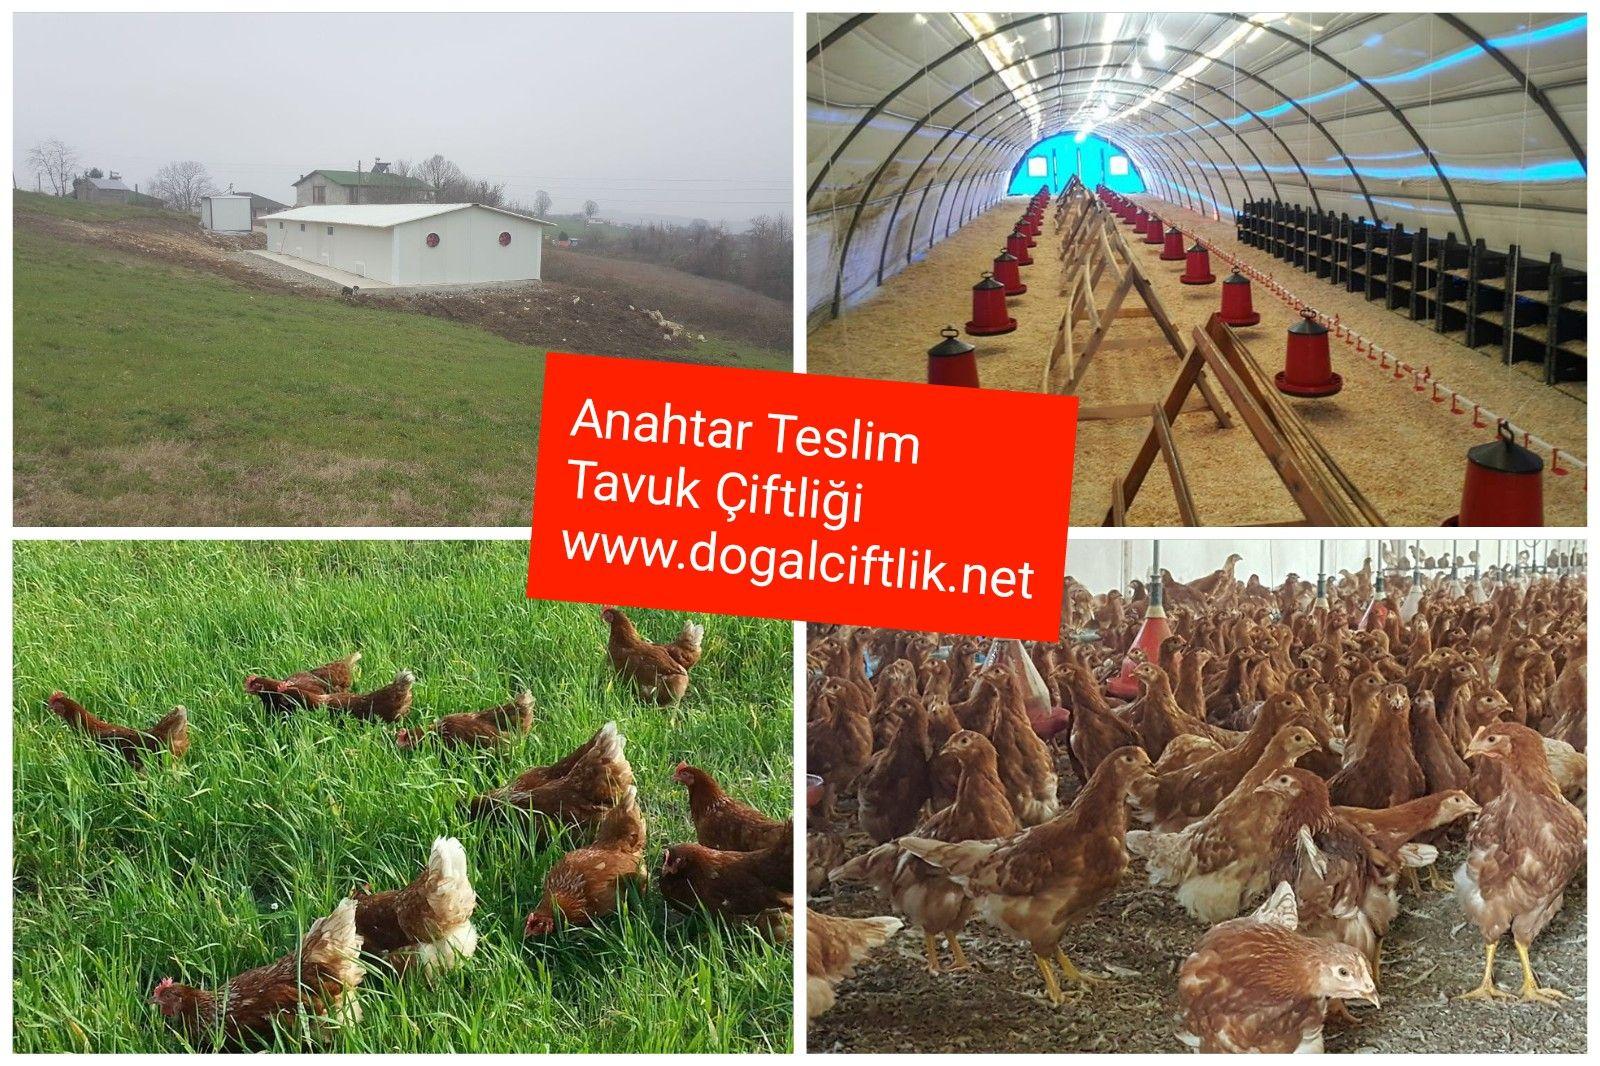 Anahtar Teslim Organik Yumurta çiftliği Fiyatları Anahtar Teslim